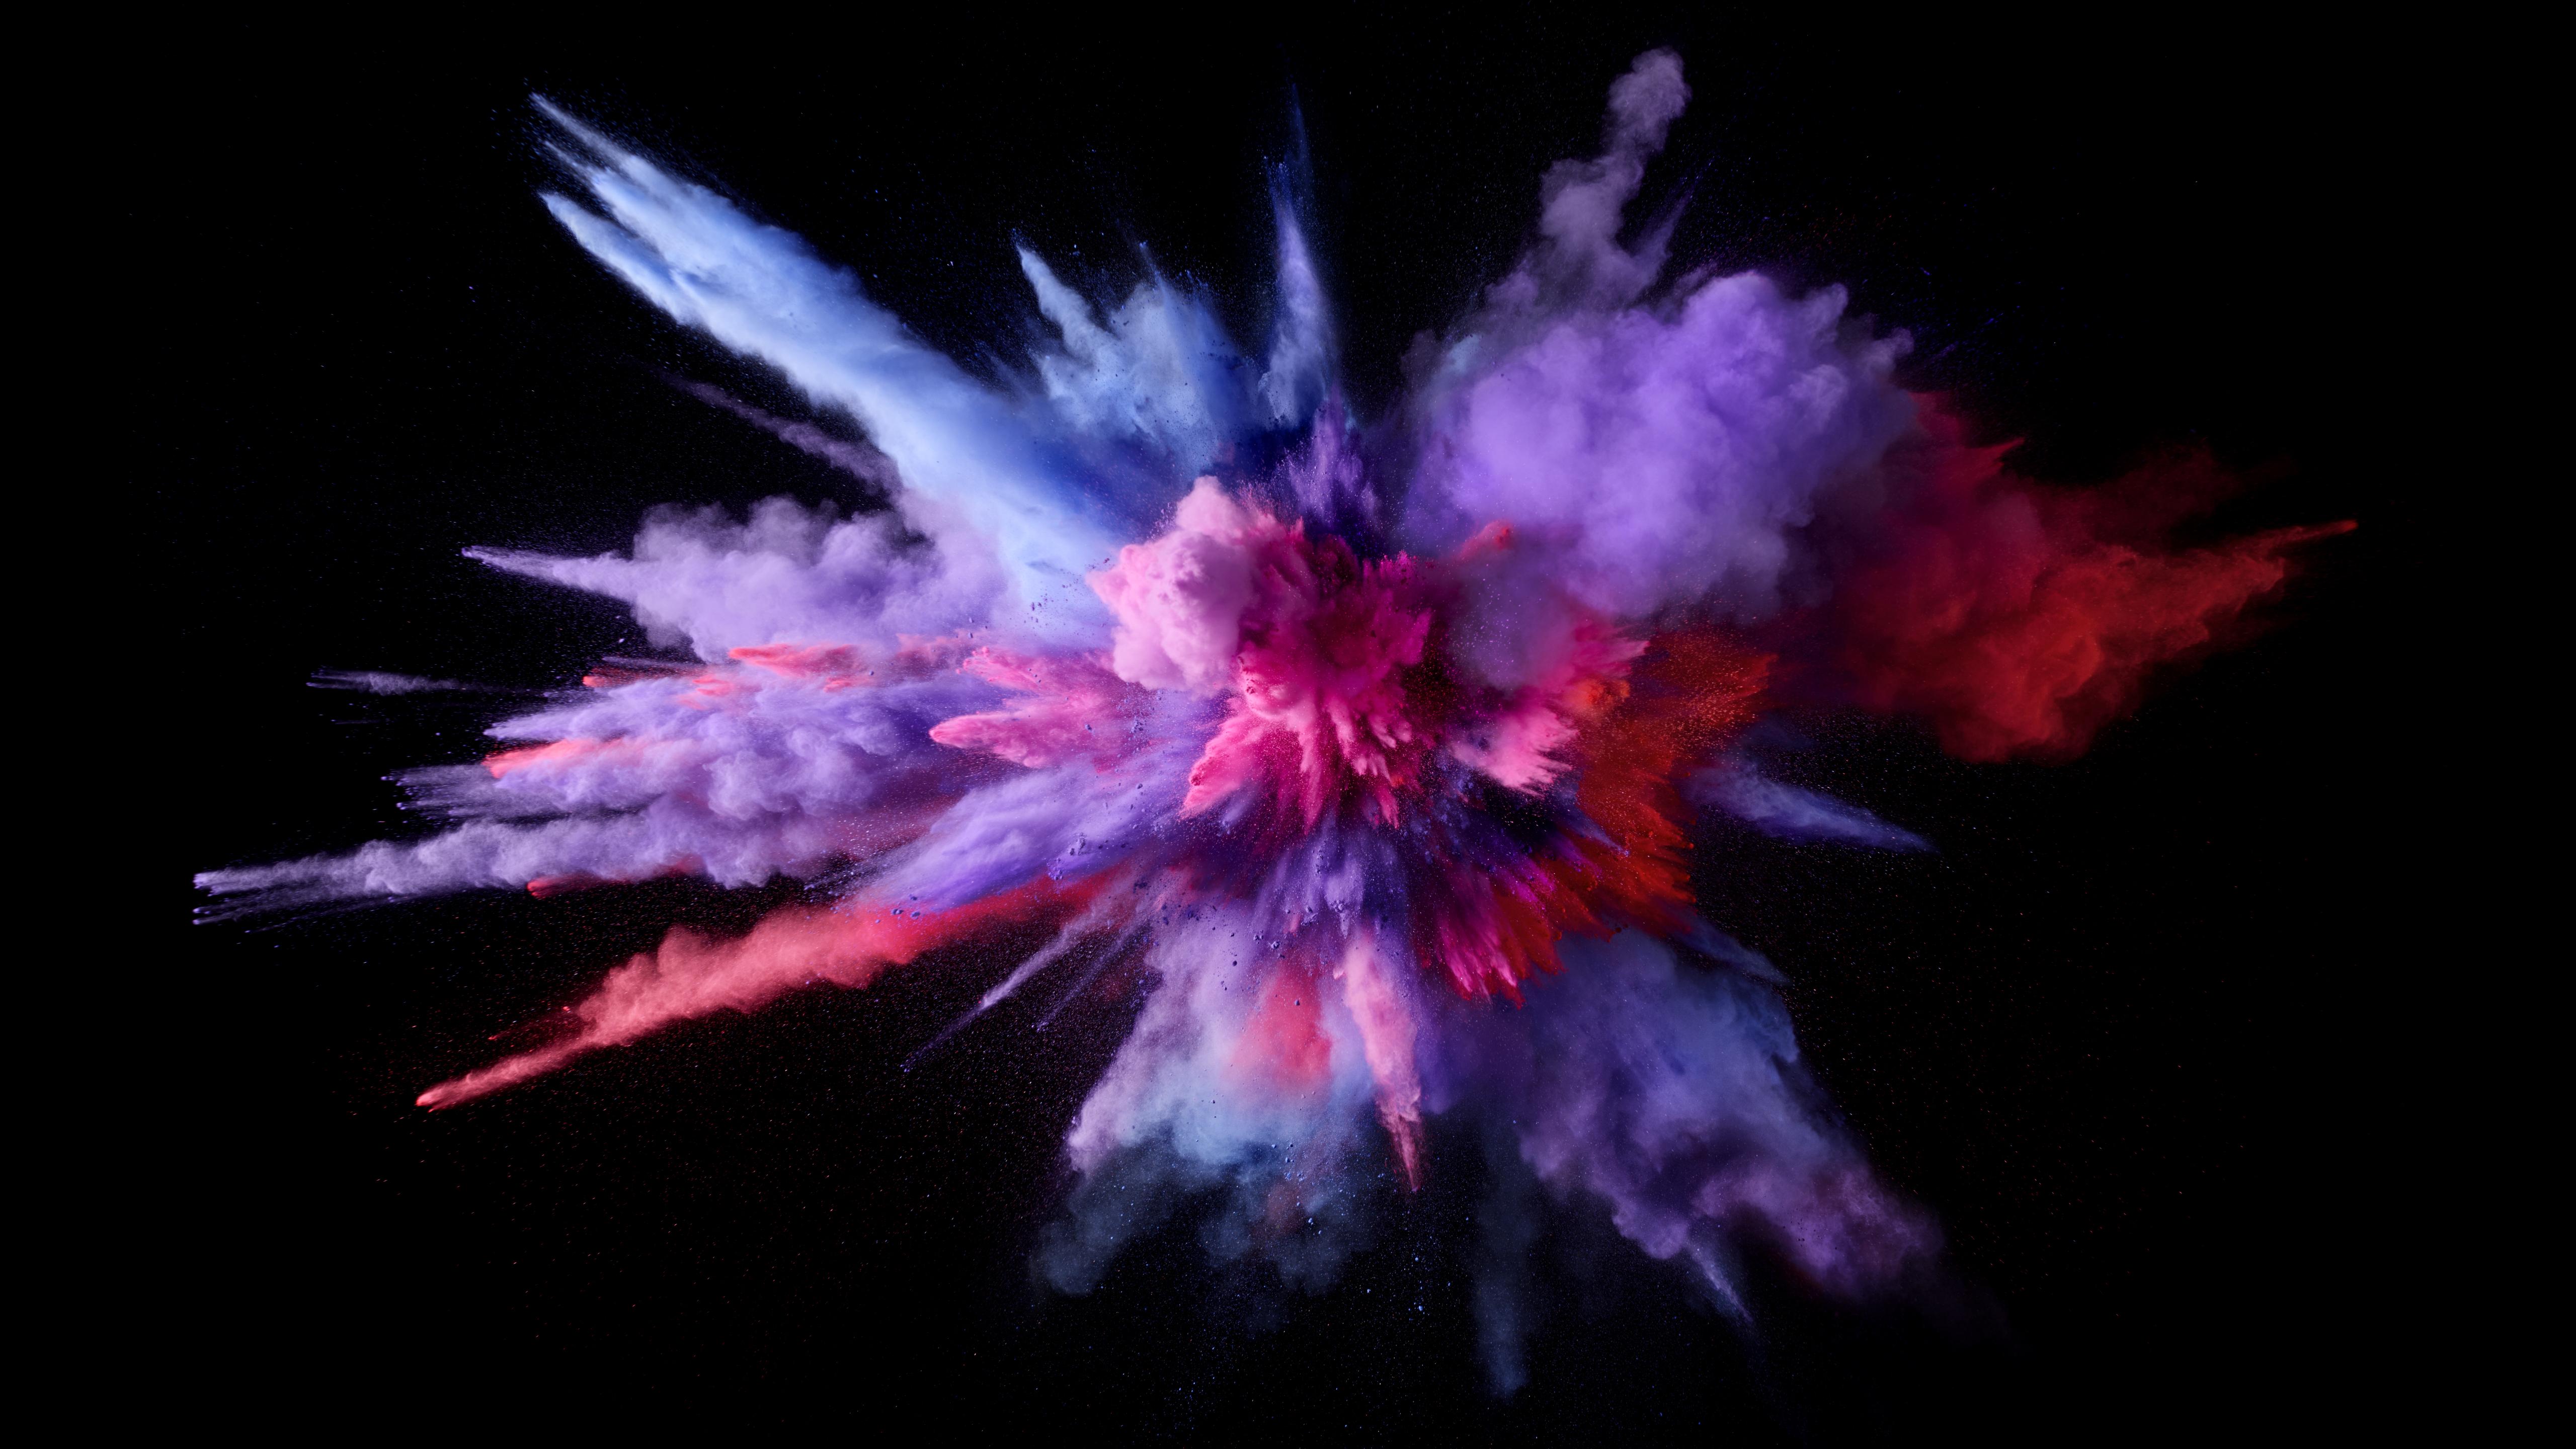 Mac OS Sierra Color Splash Purple